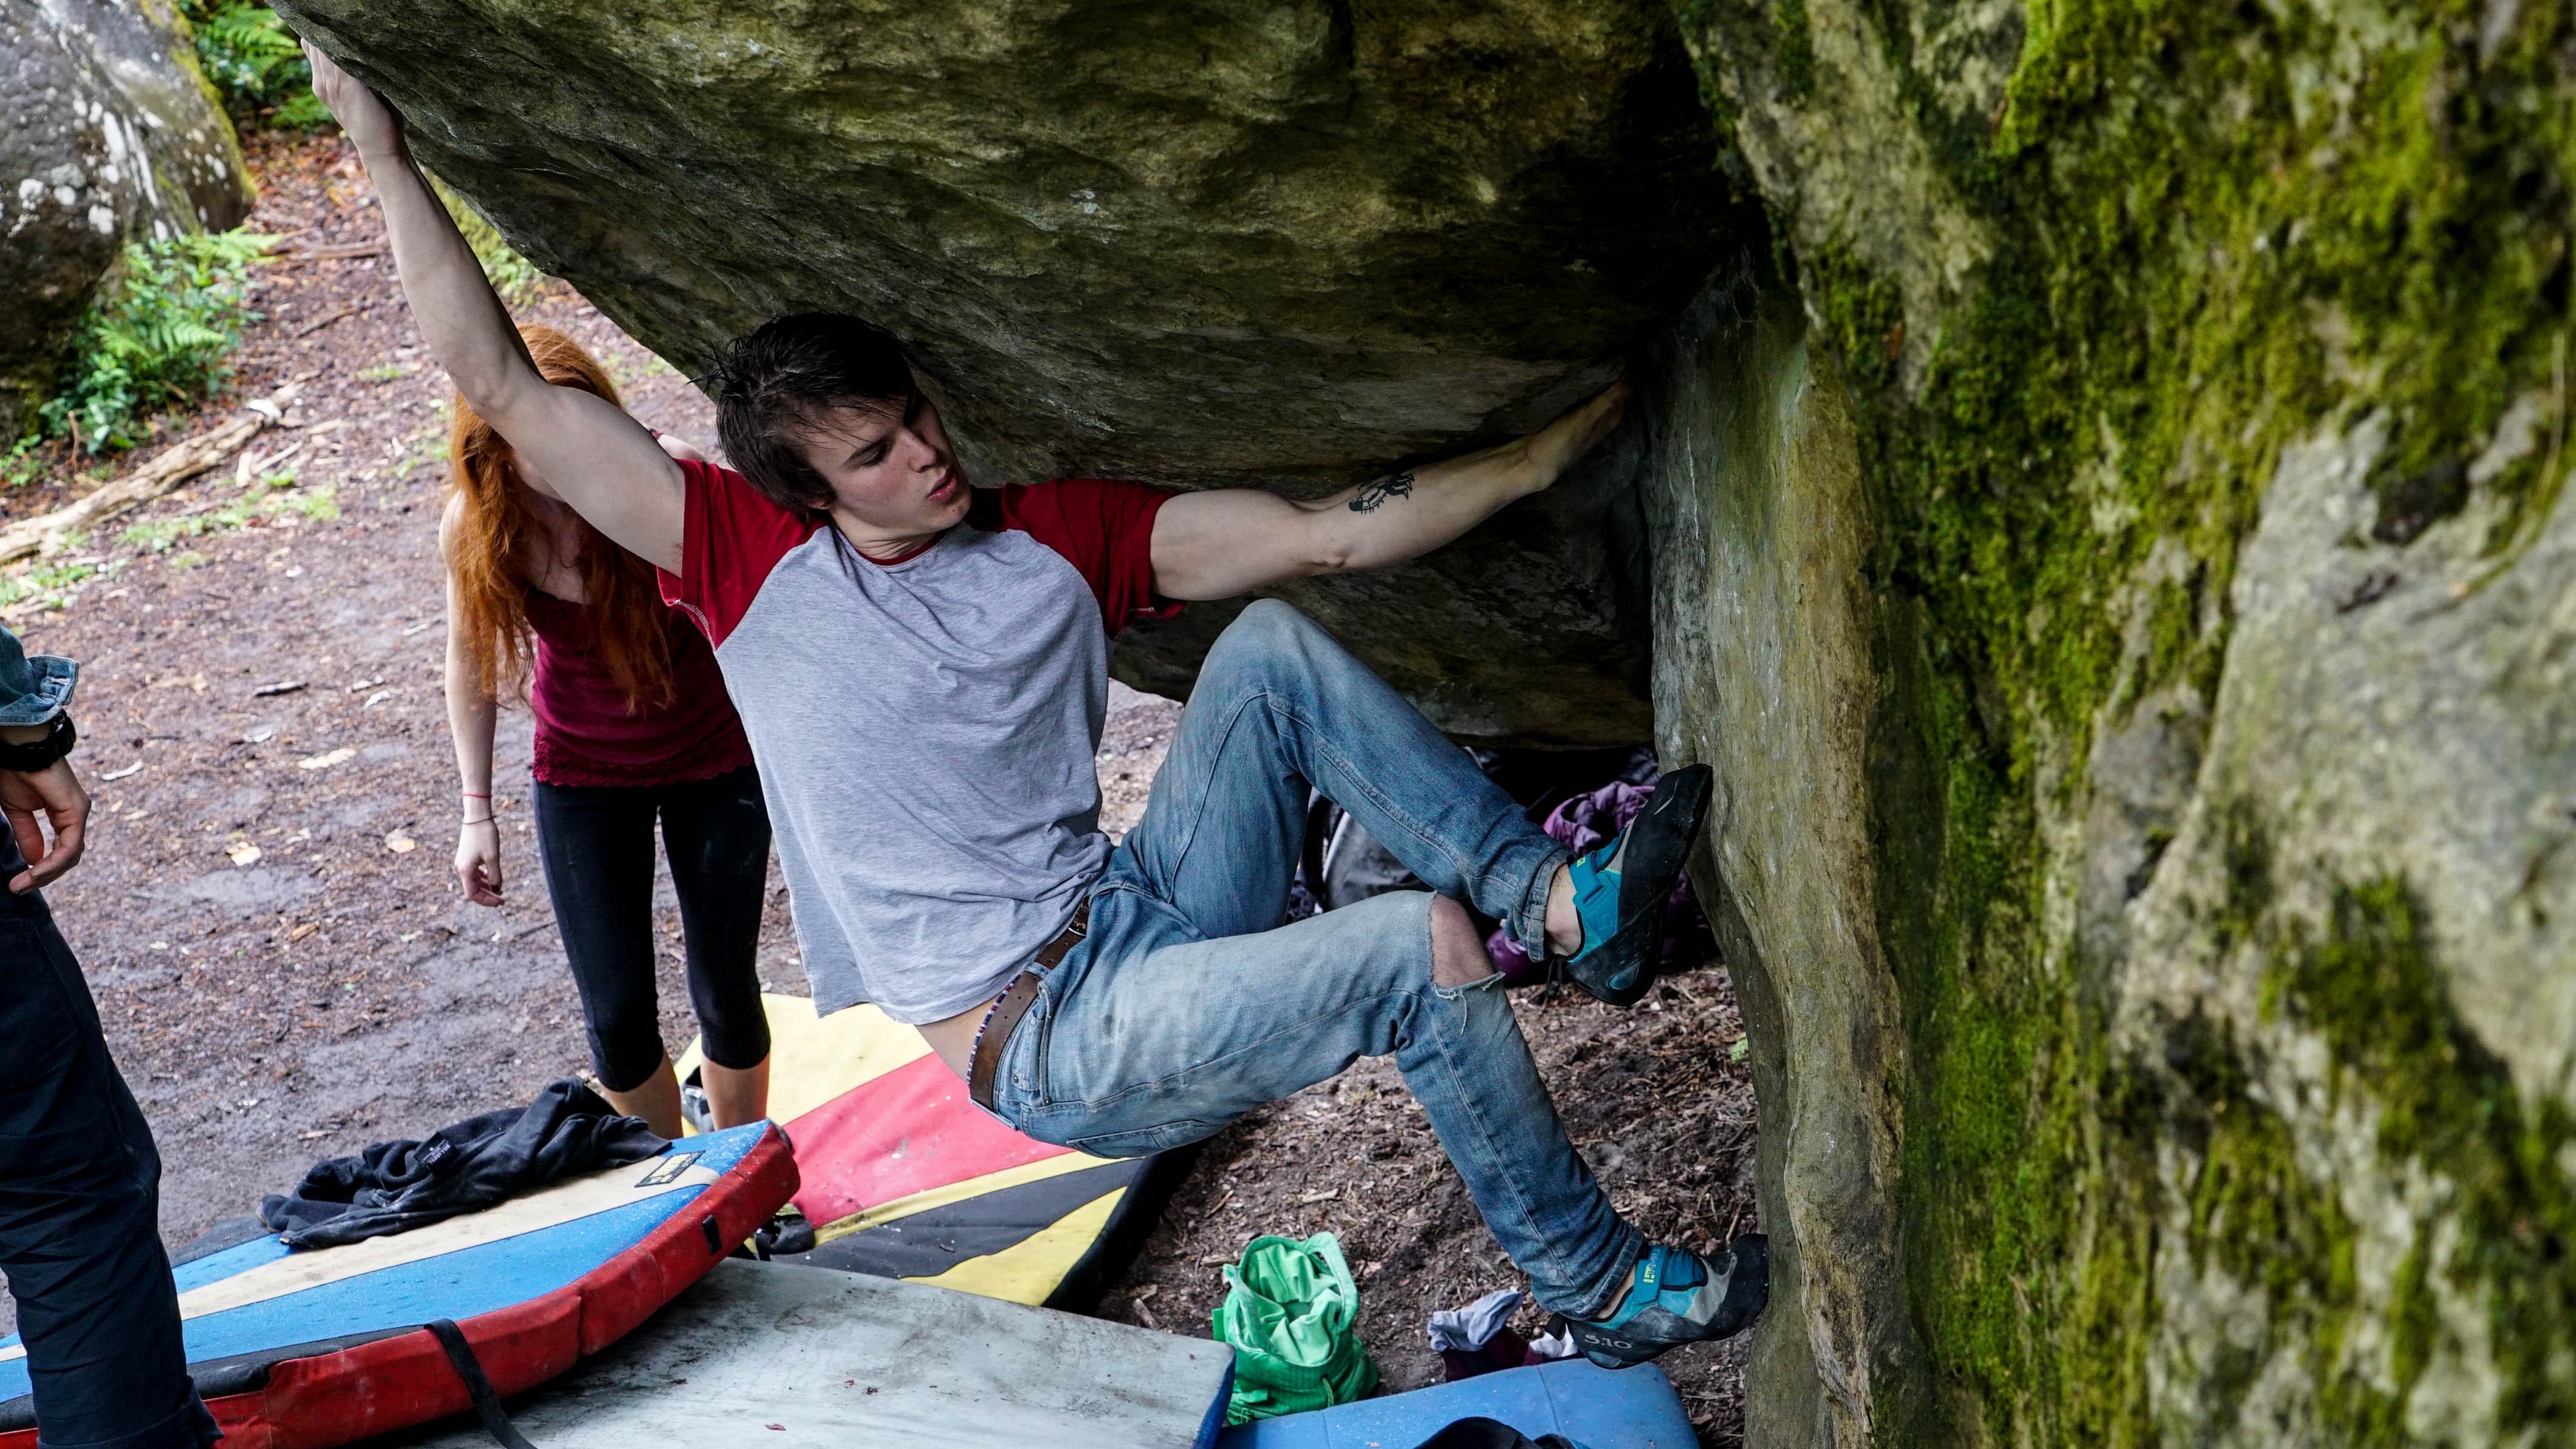 fontainbleau climbing 2016 mike brindley-12